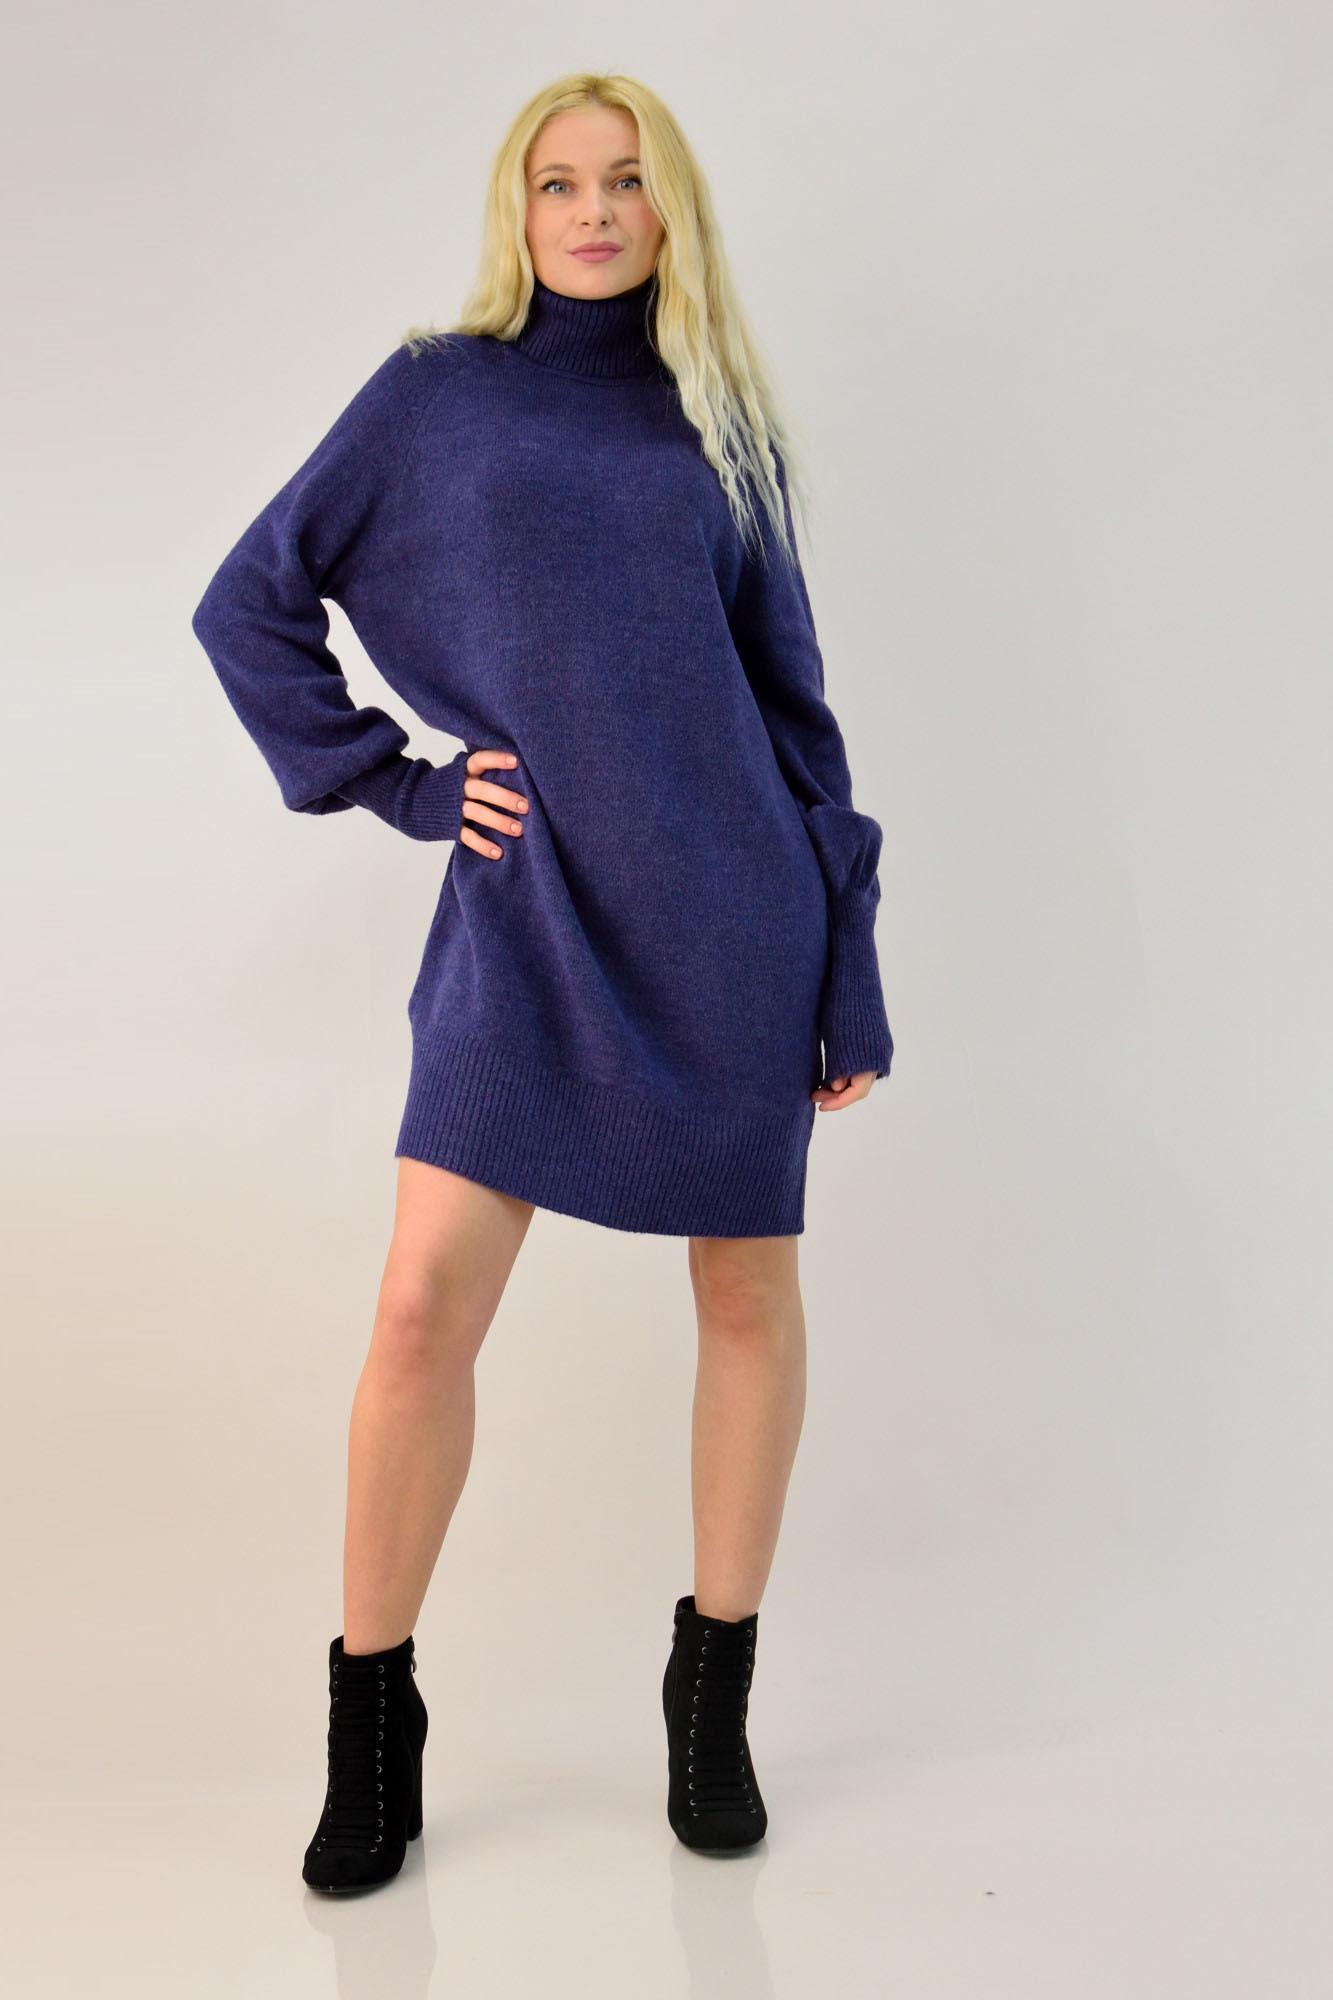 d6b67e42ba0b Γυναικείο πλεκτό φόρεμα oversized. Tap to expand